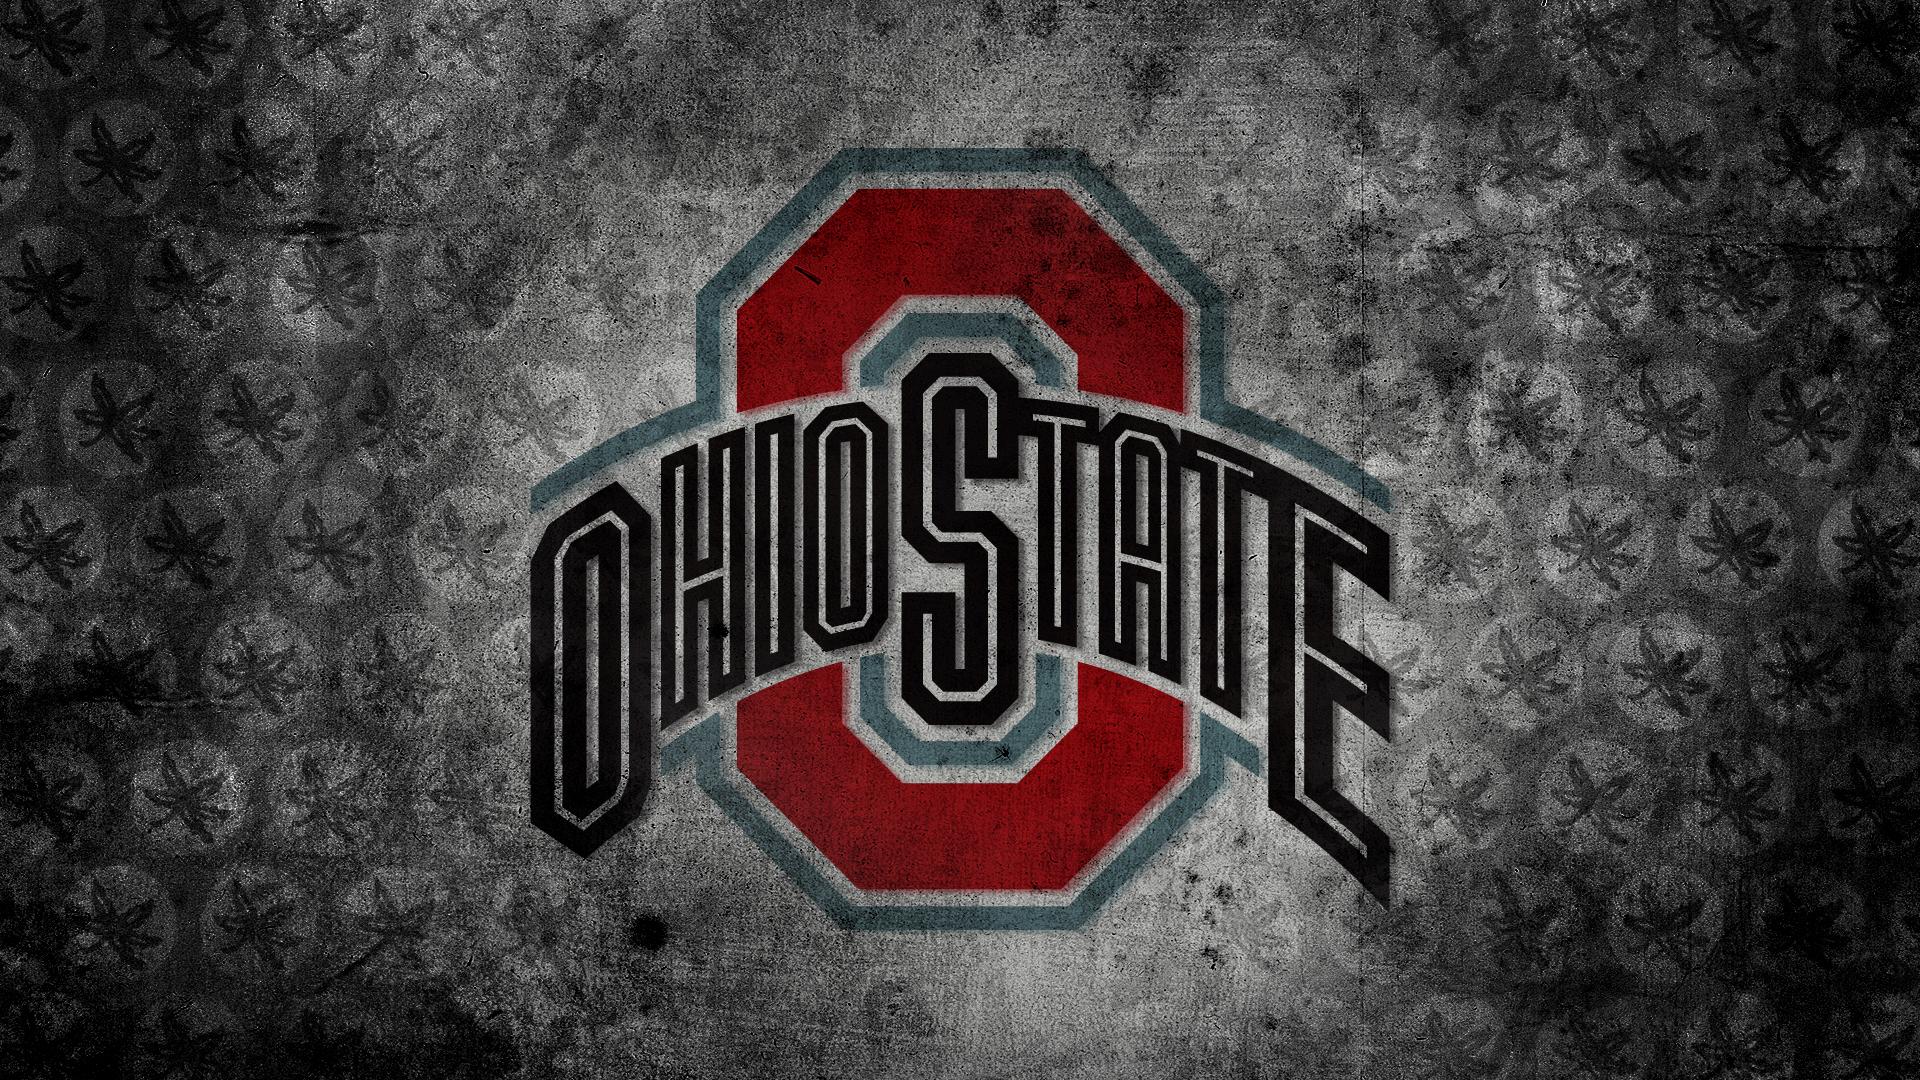 Ohio State Logo Wallpaper: Ohio State Logo Wallpaper